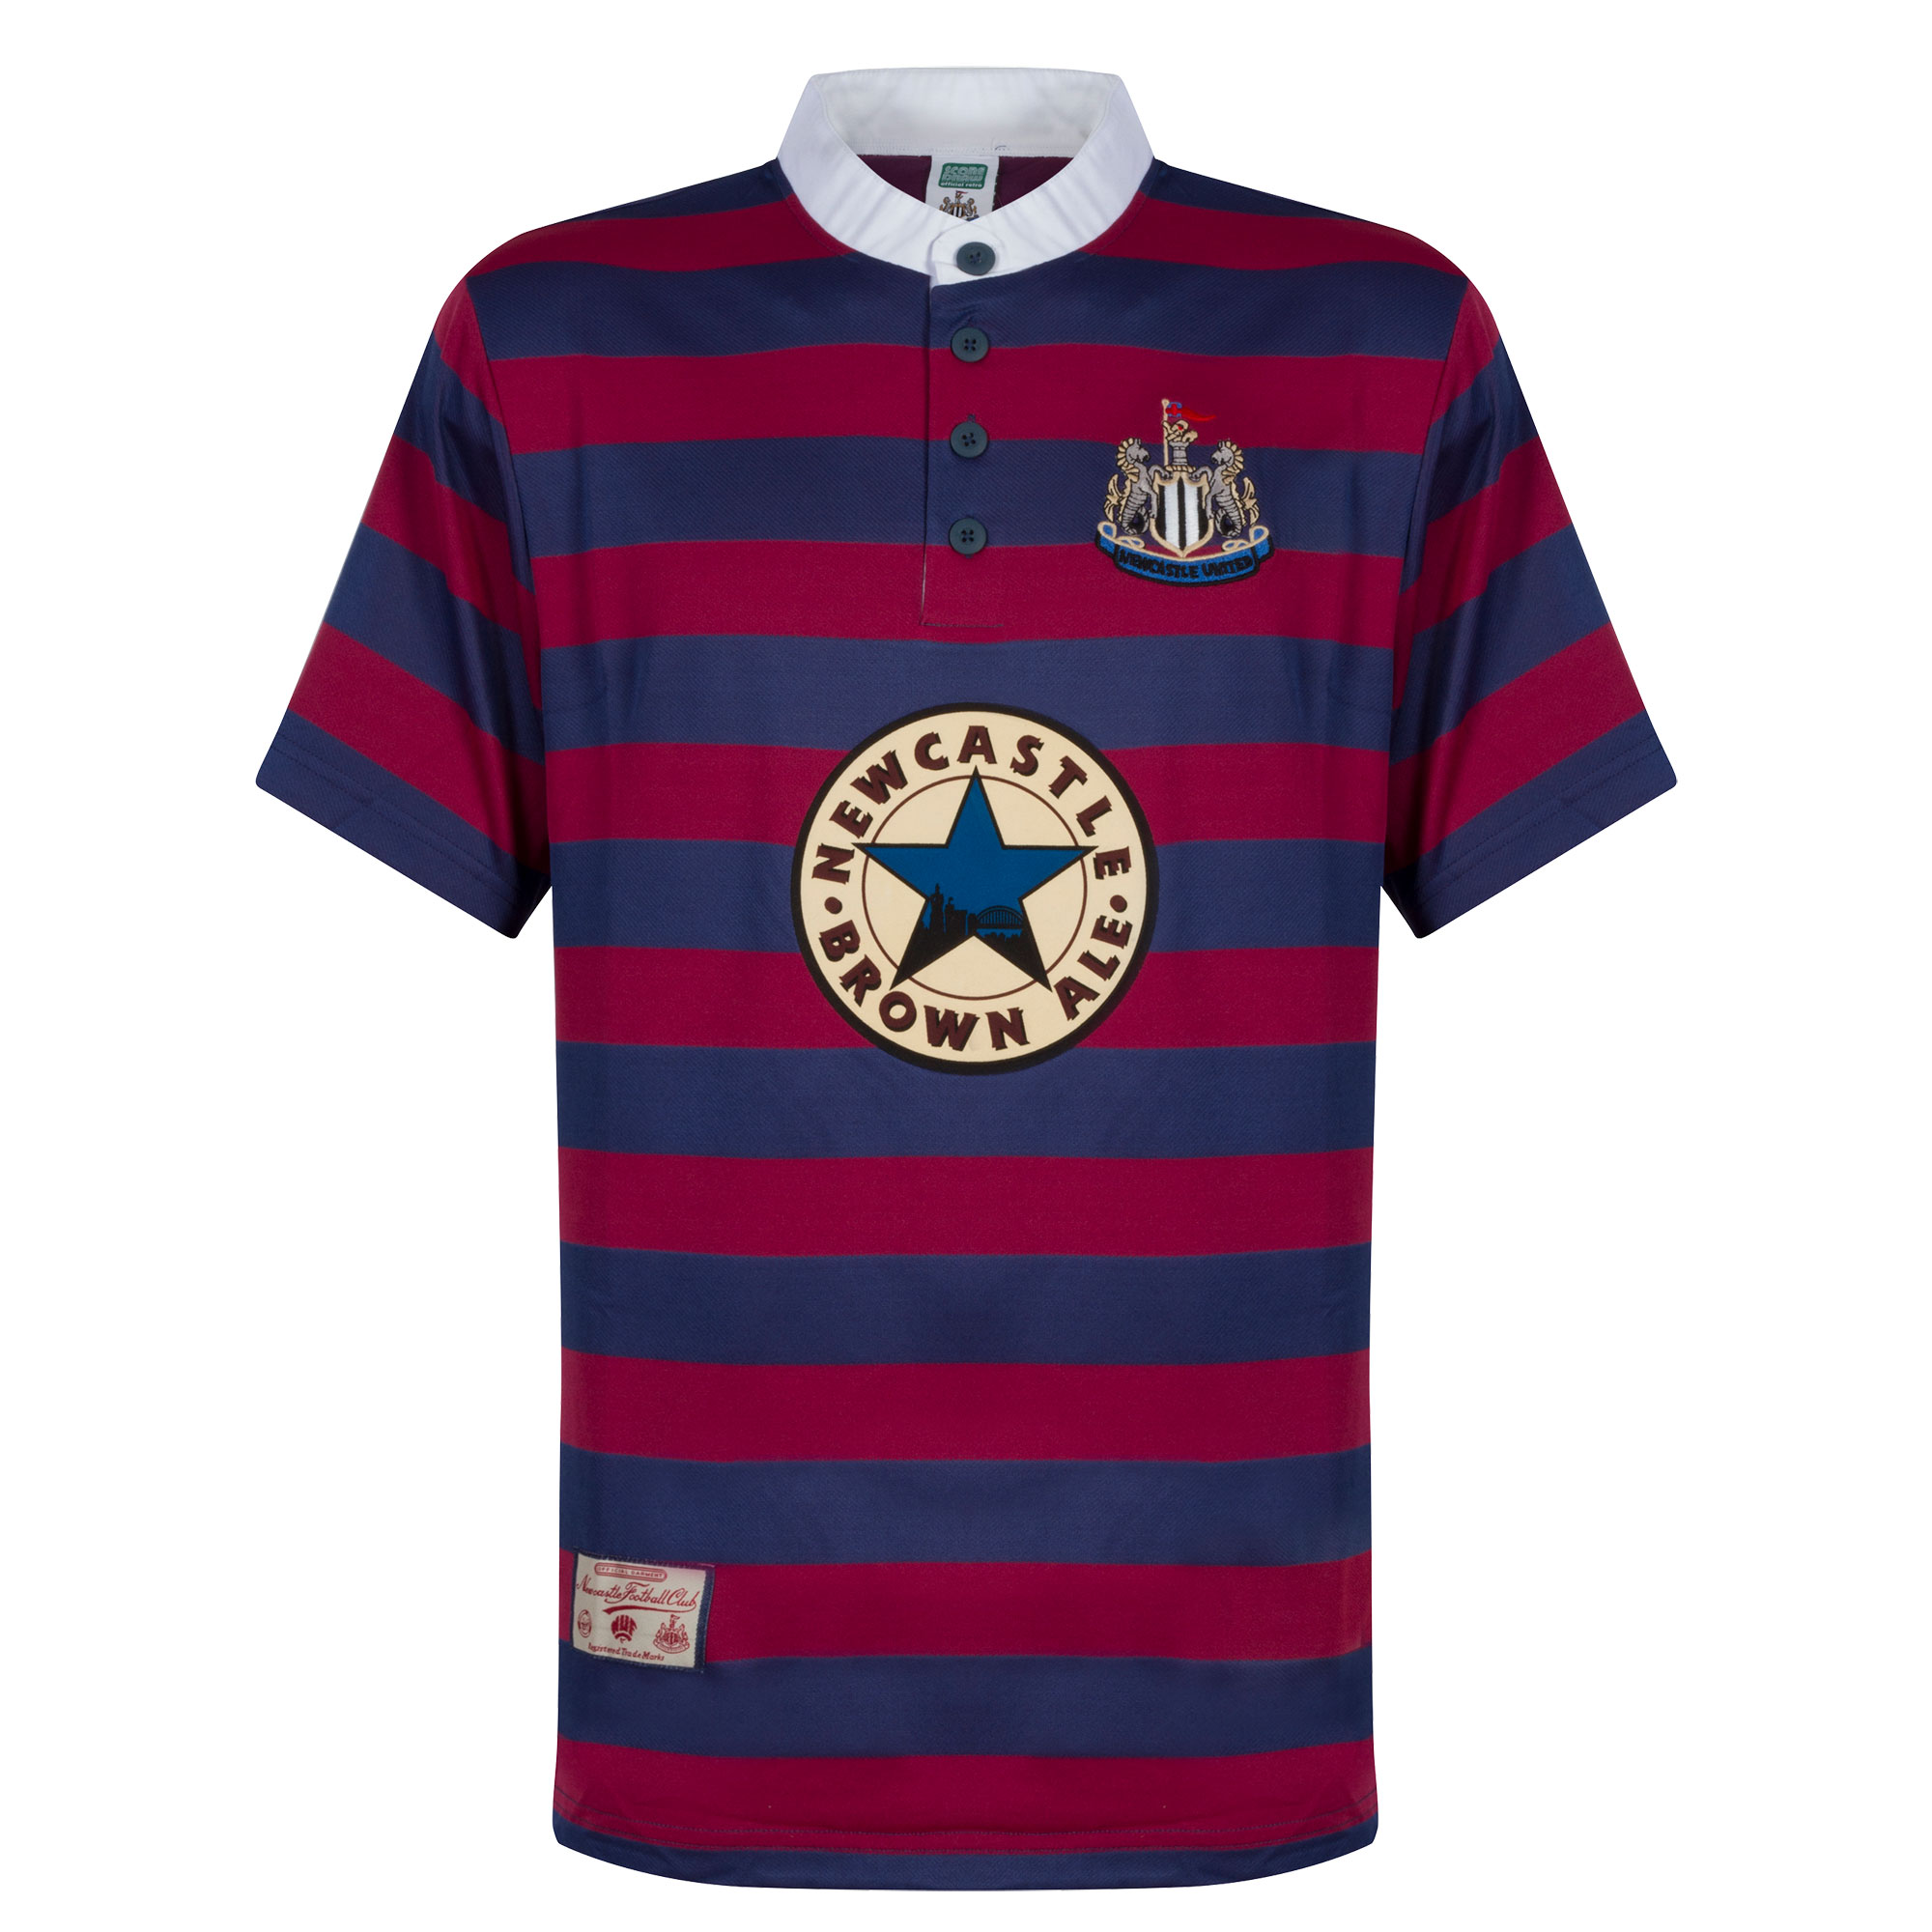 Score Draw Newcastle Utd Away Retro Shirt 1996-1997